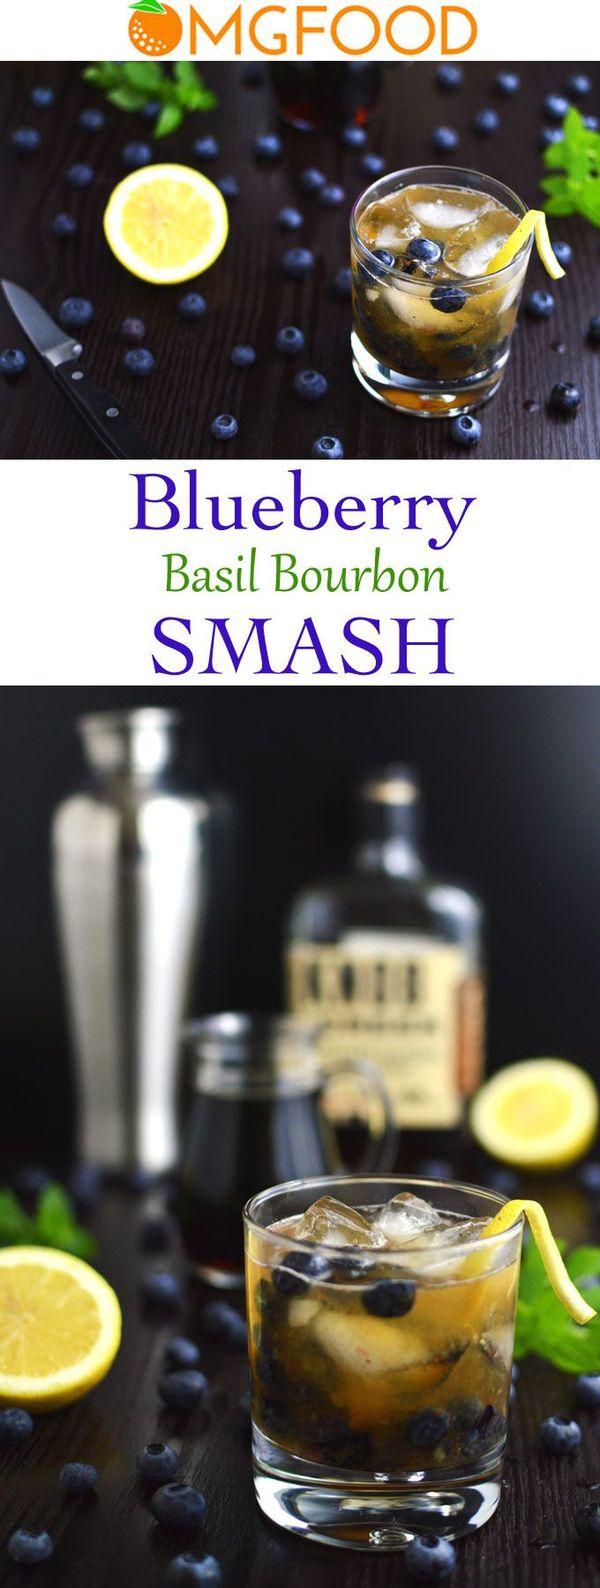 Blueberry Basil Bourbon Smash